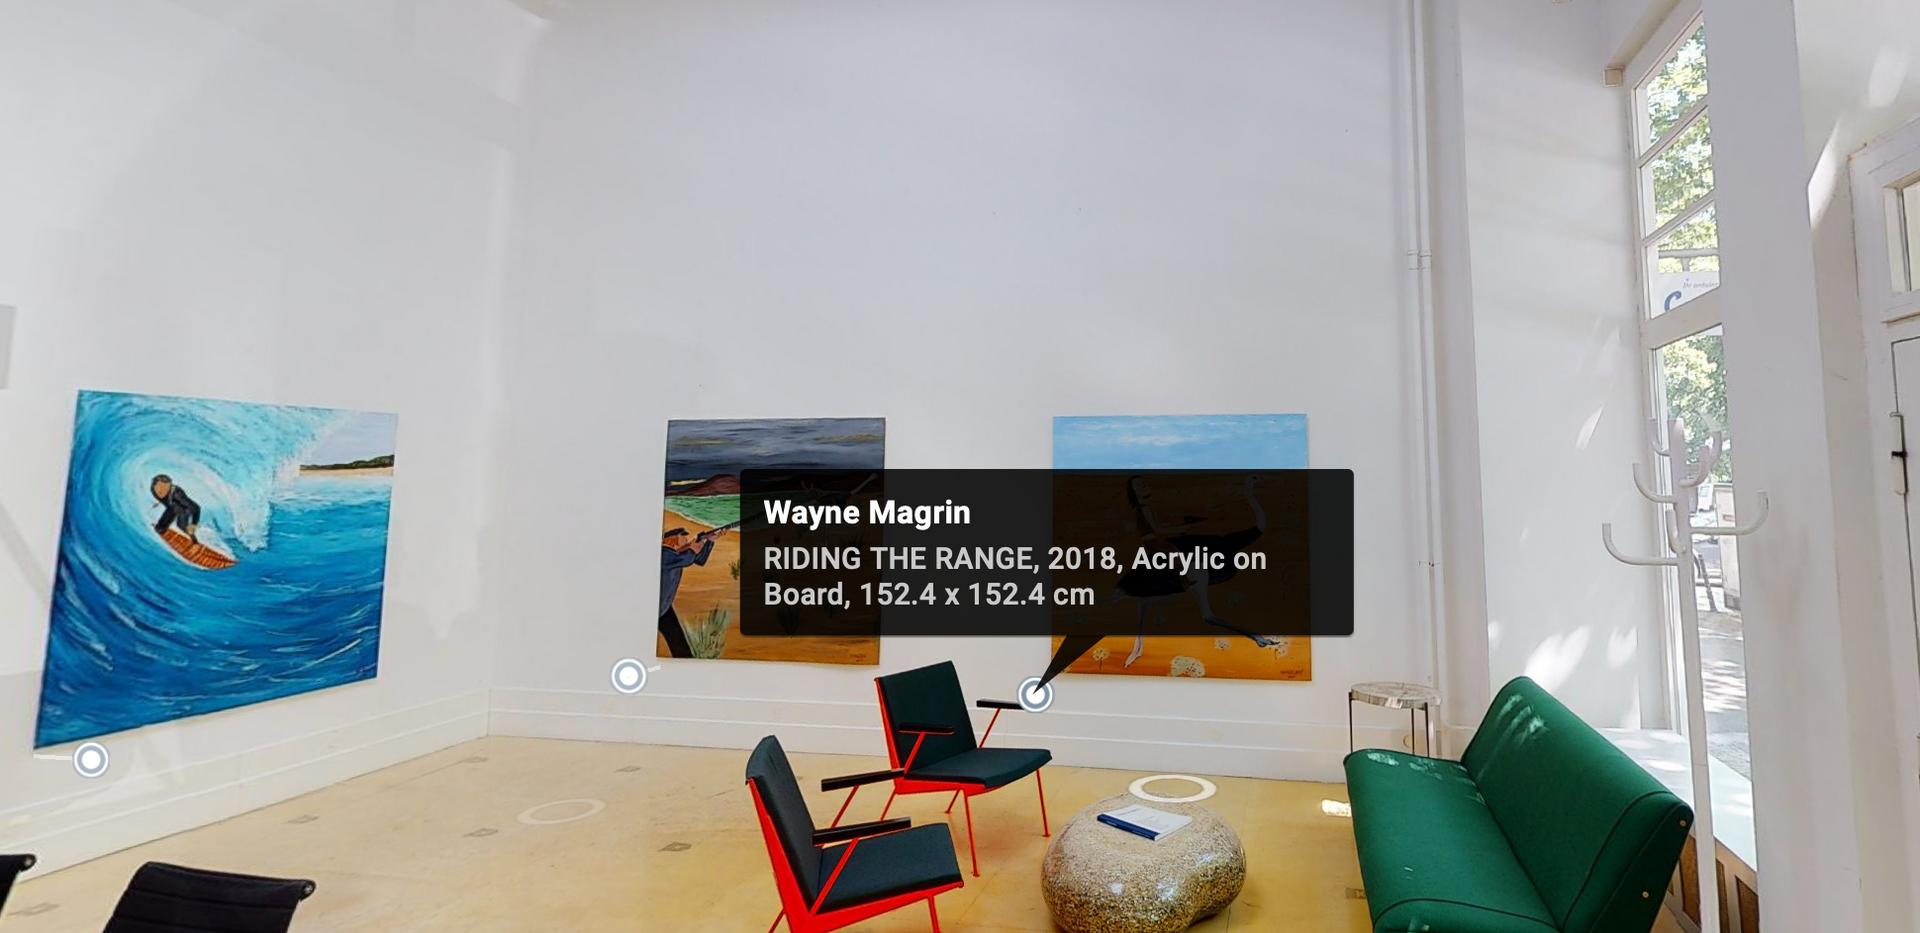 virtual Tour  Wayne Magrin exhibition @Office Reiner Opoku